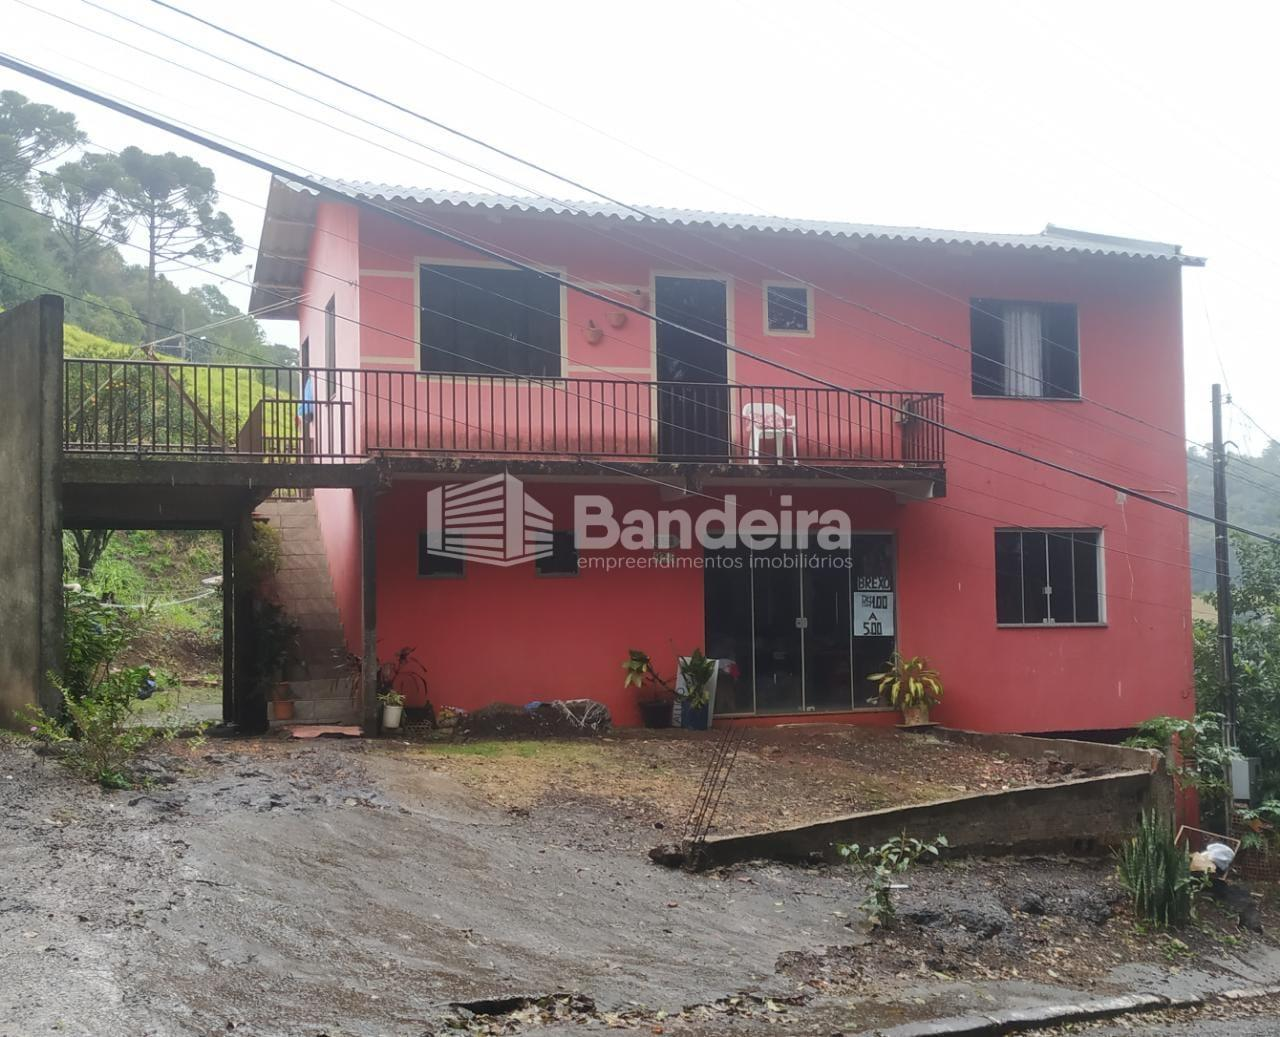 SOBRADO COMERCIAL E RESIDENCIAL - ACEITA CHÁCARA COMO PARTE DO PAGAMENTO